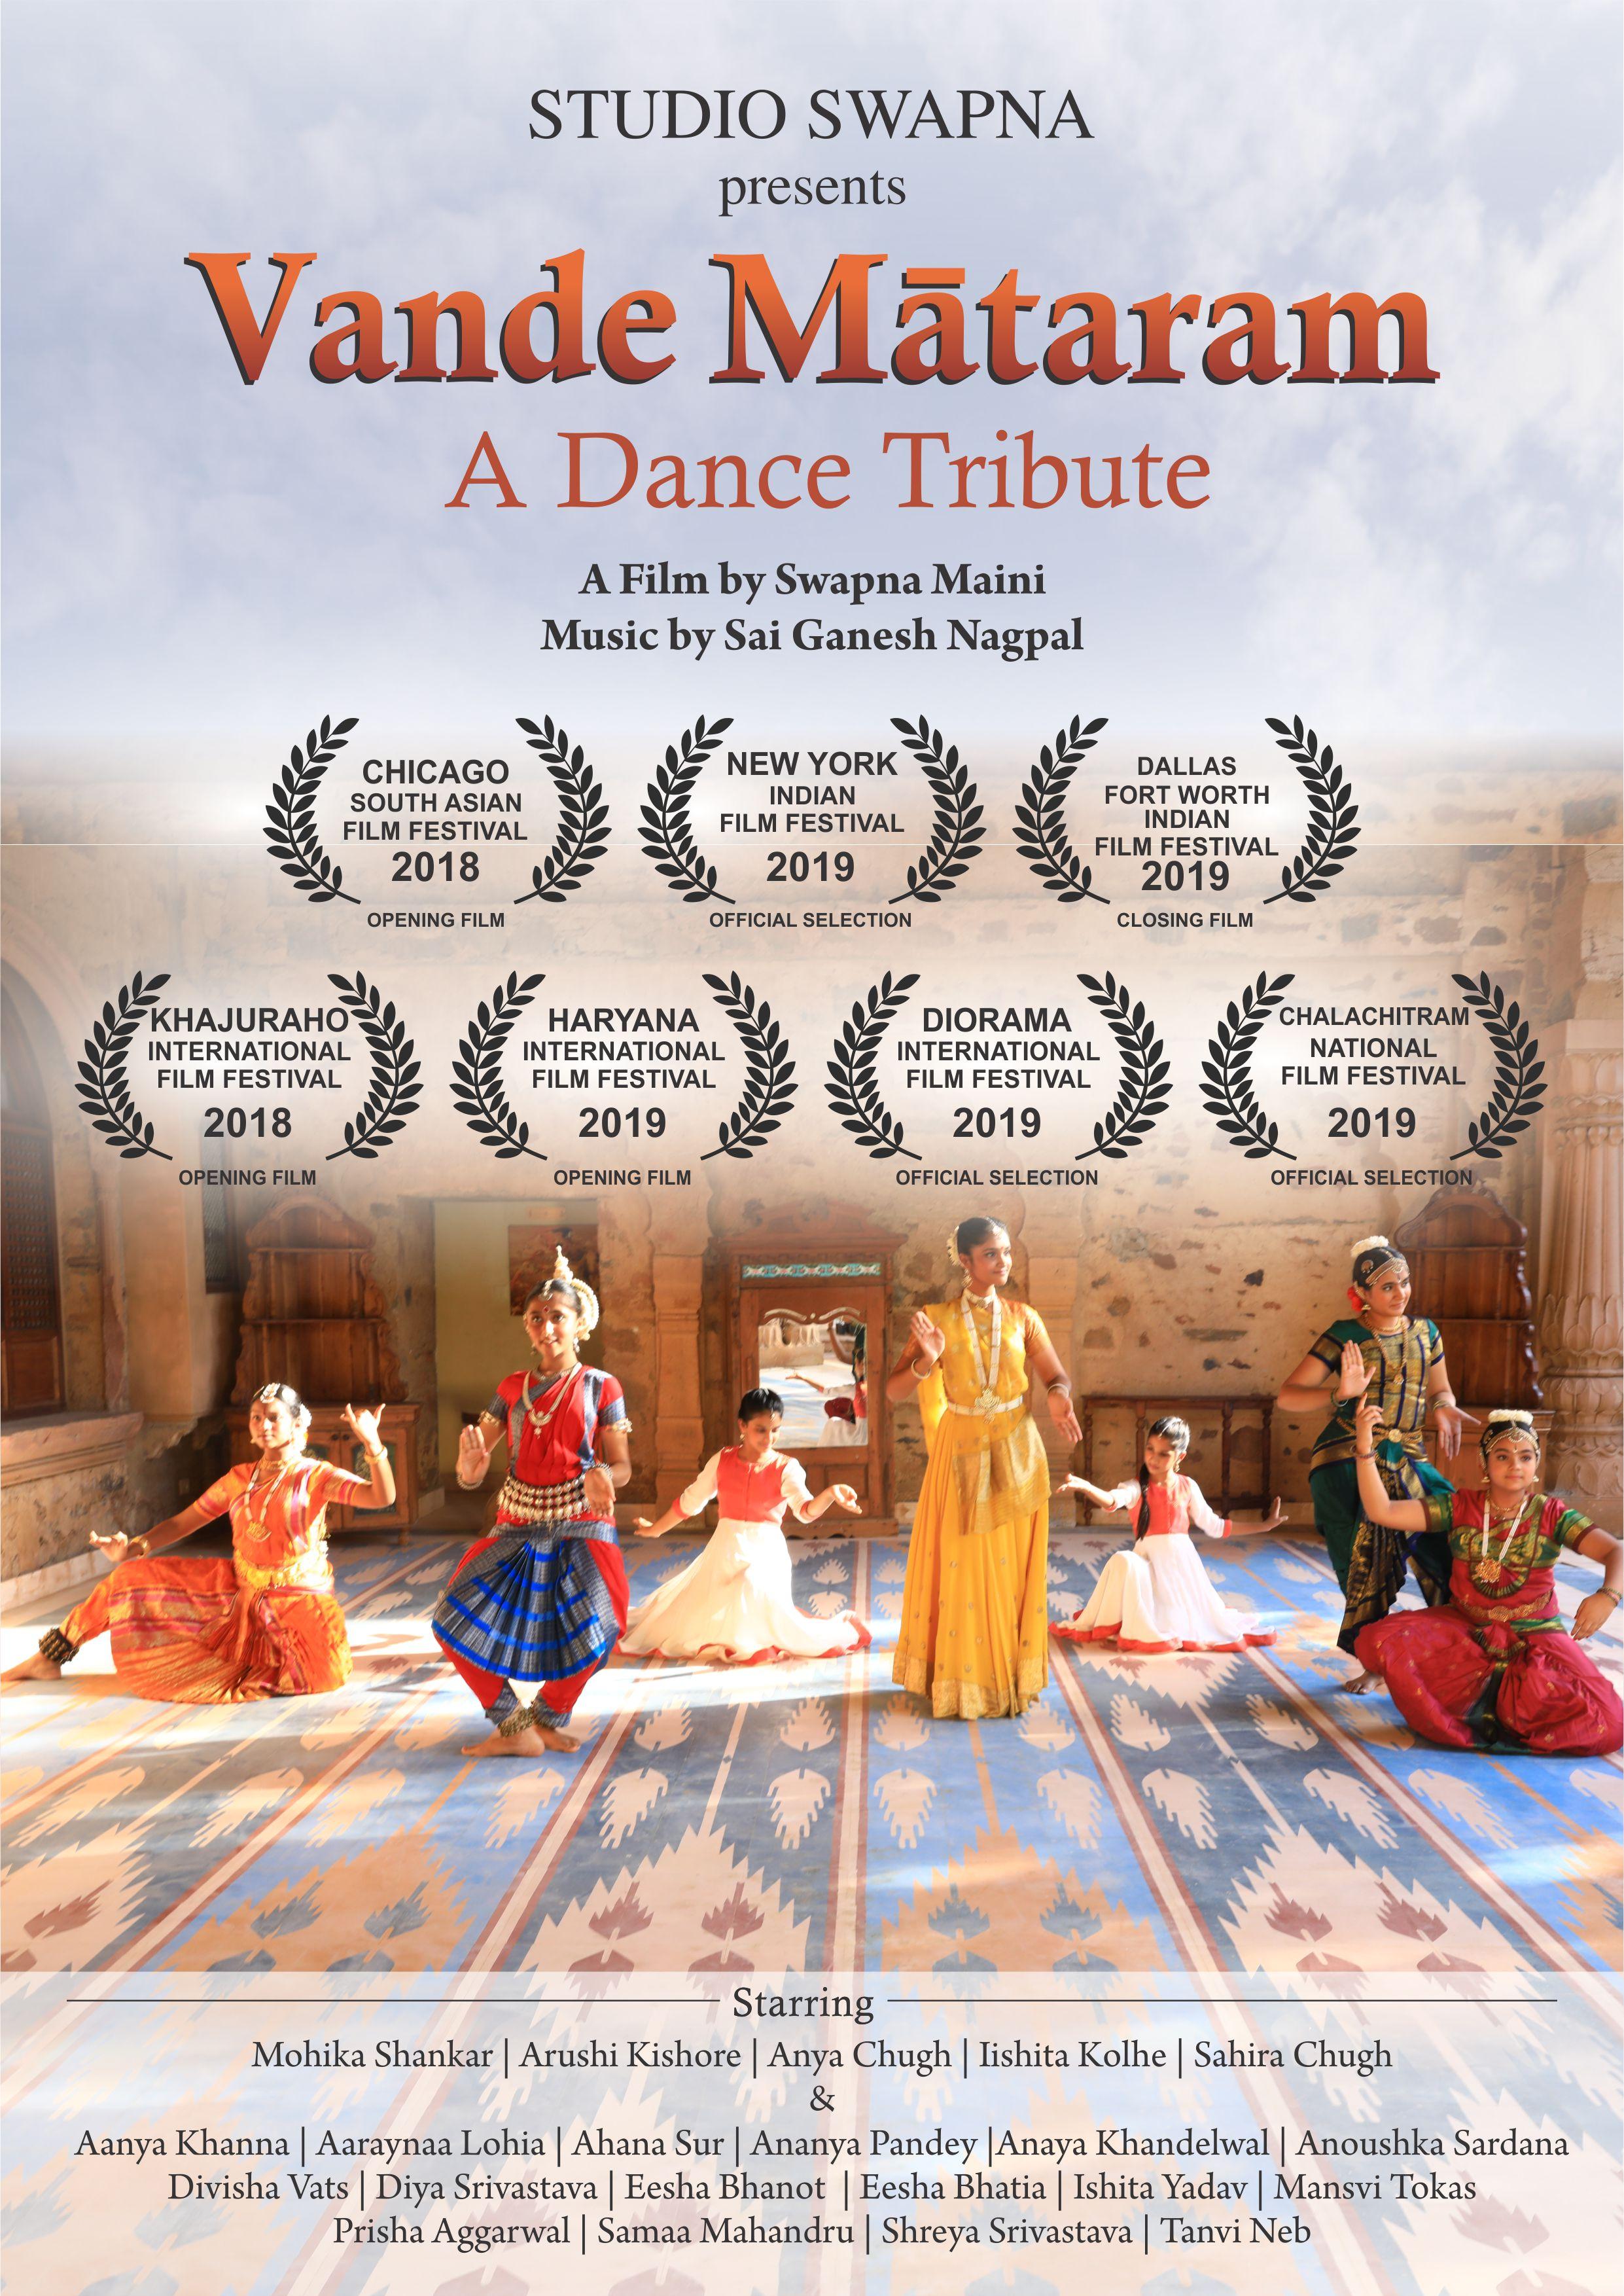 Vande Mataram_A Dance Tribute_Poster.jpg